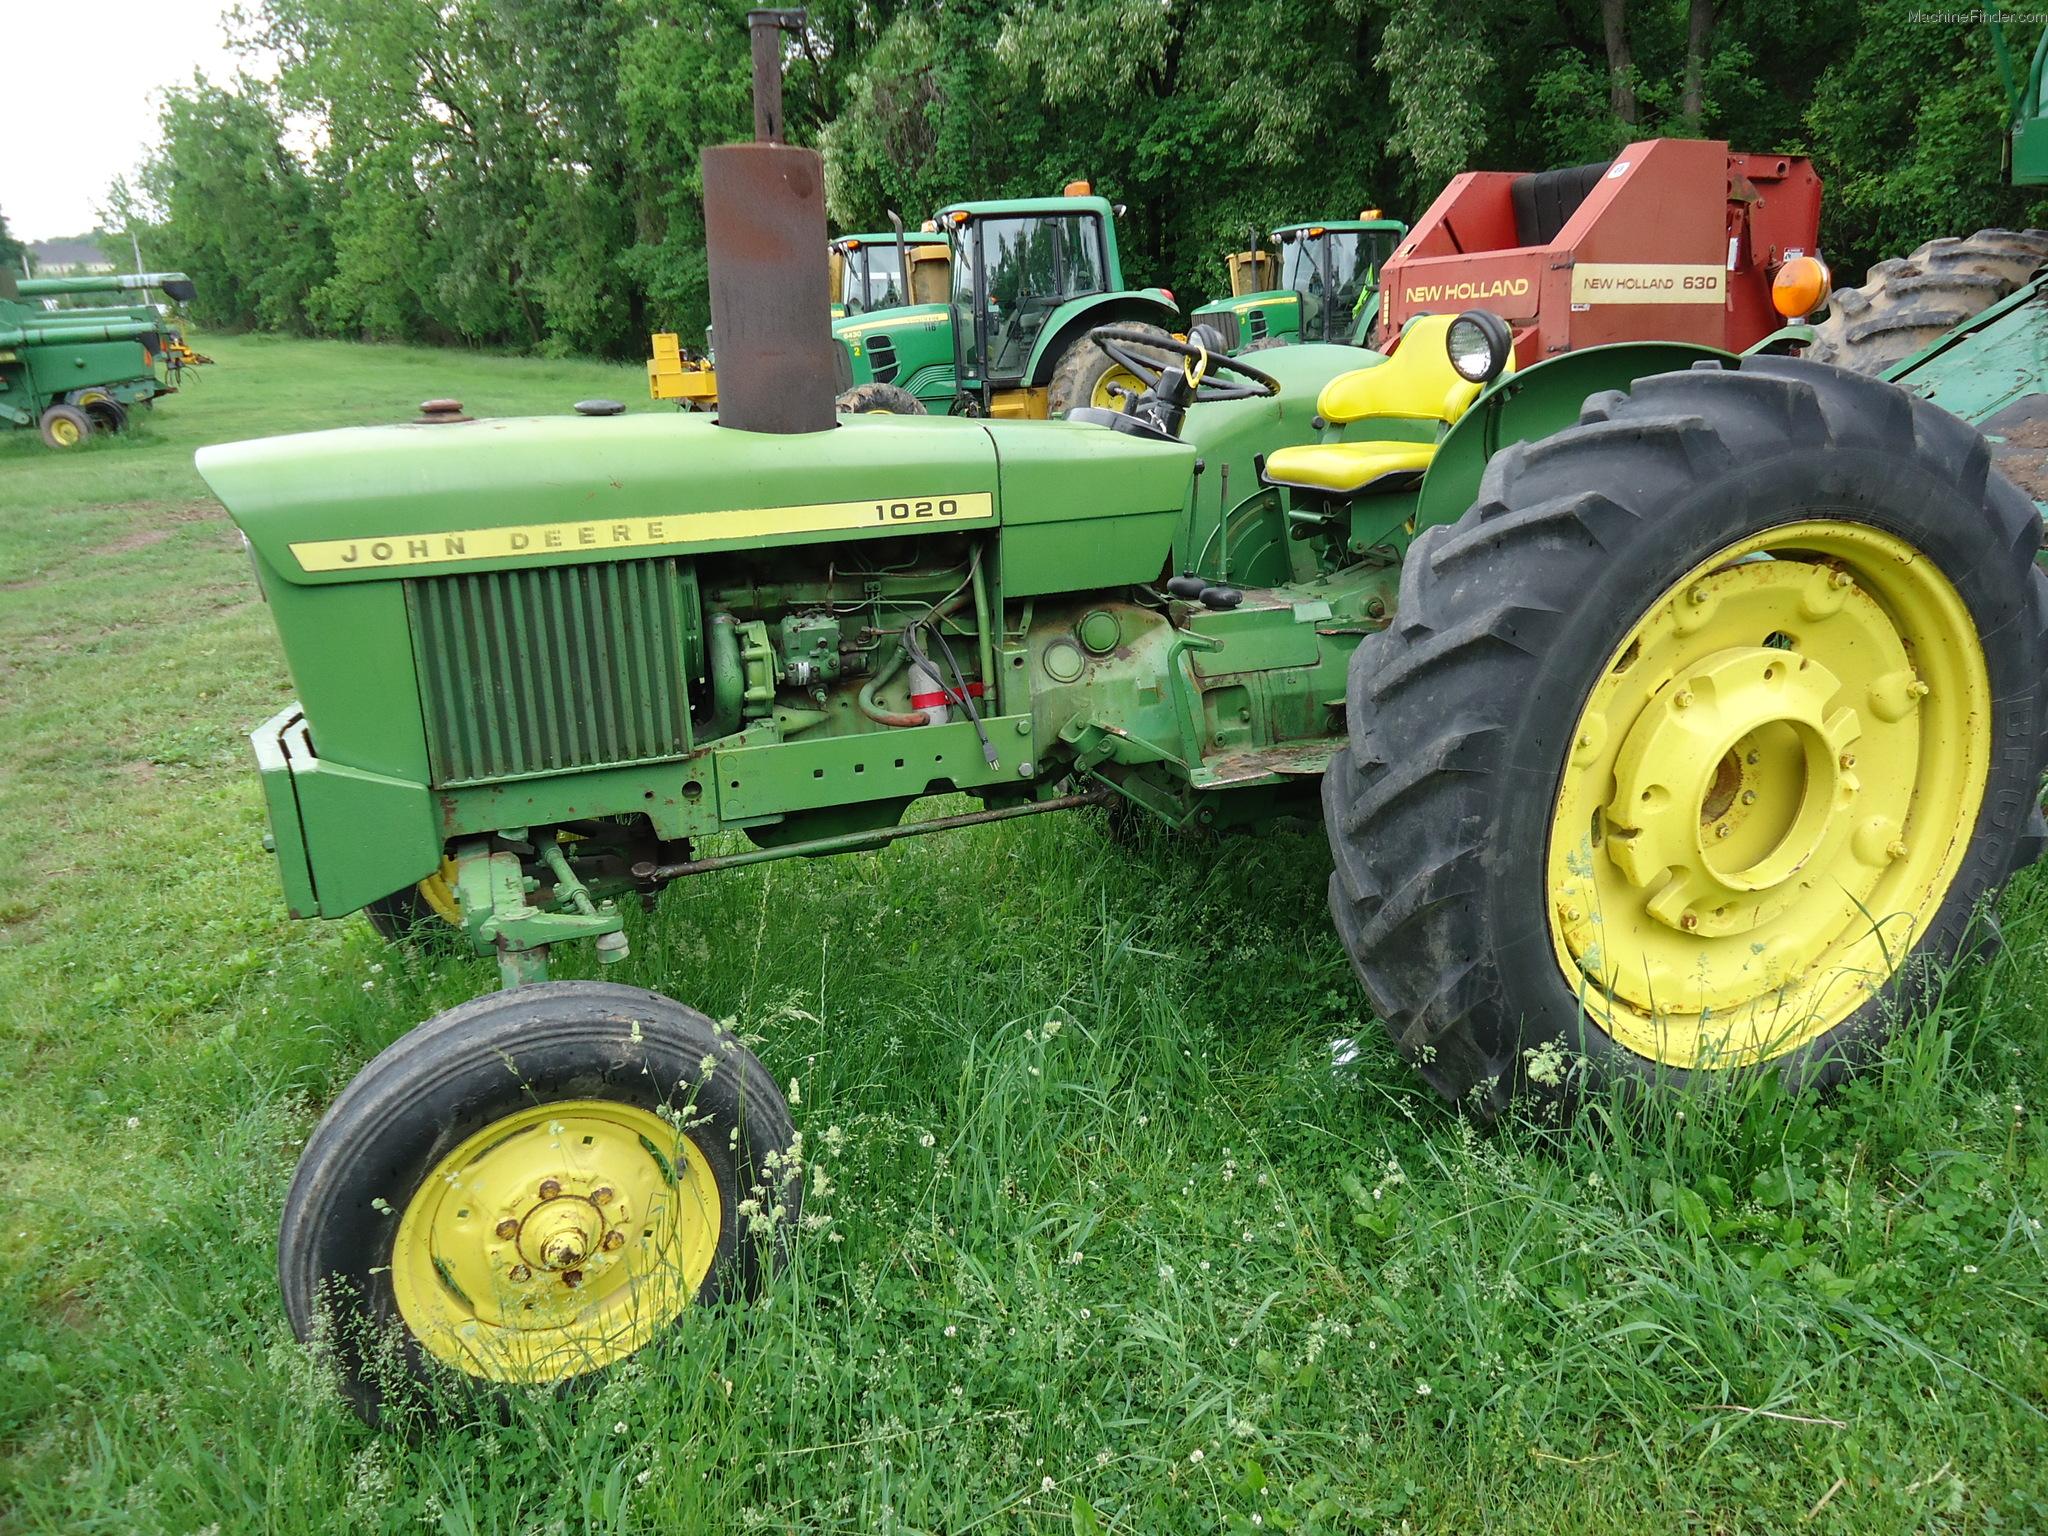 1967 John Deere 1020 Tractors - Utility (40-100hp) - John ...